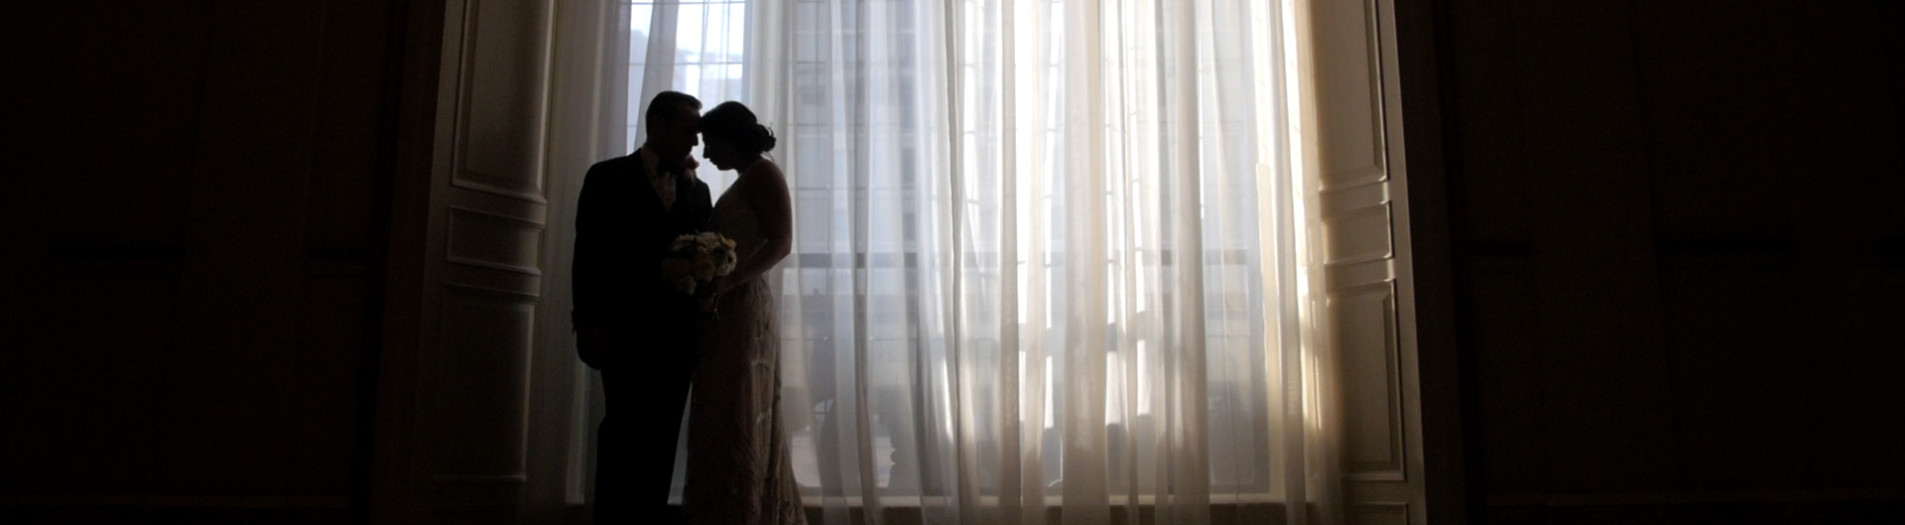 Janine & Marco // Fairmont Hotel Vancouver // Vancouver Wedding Film